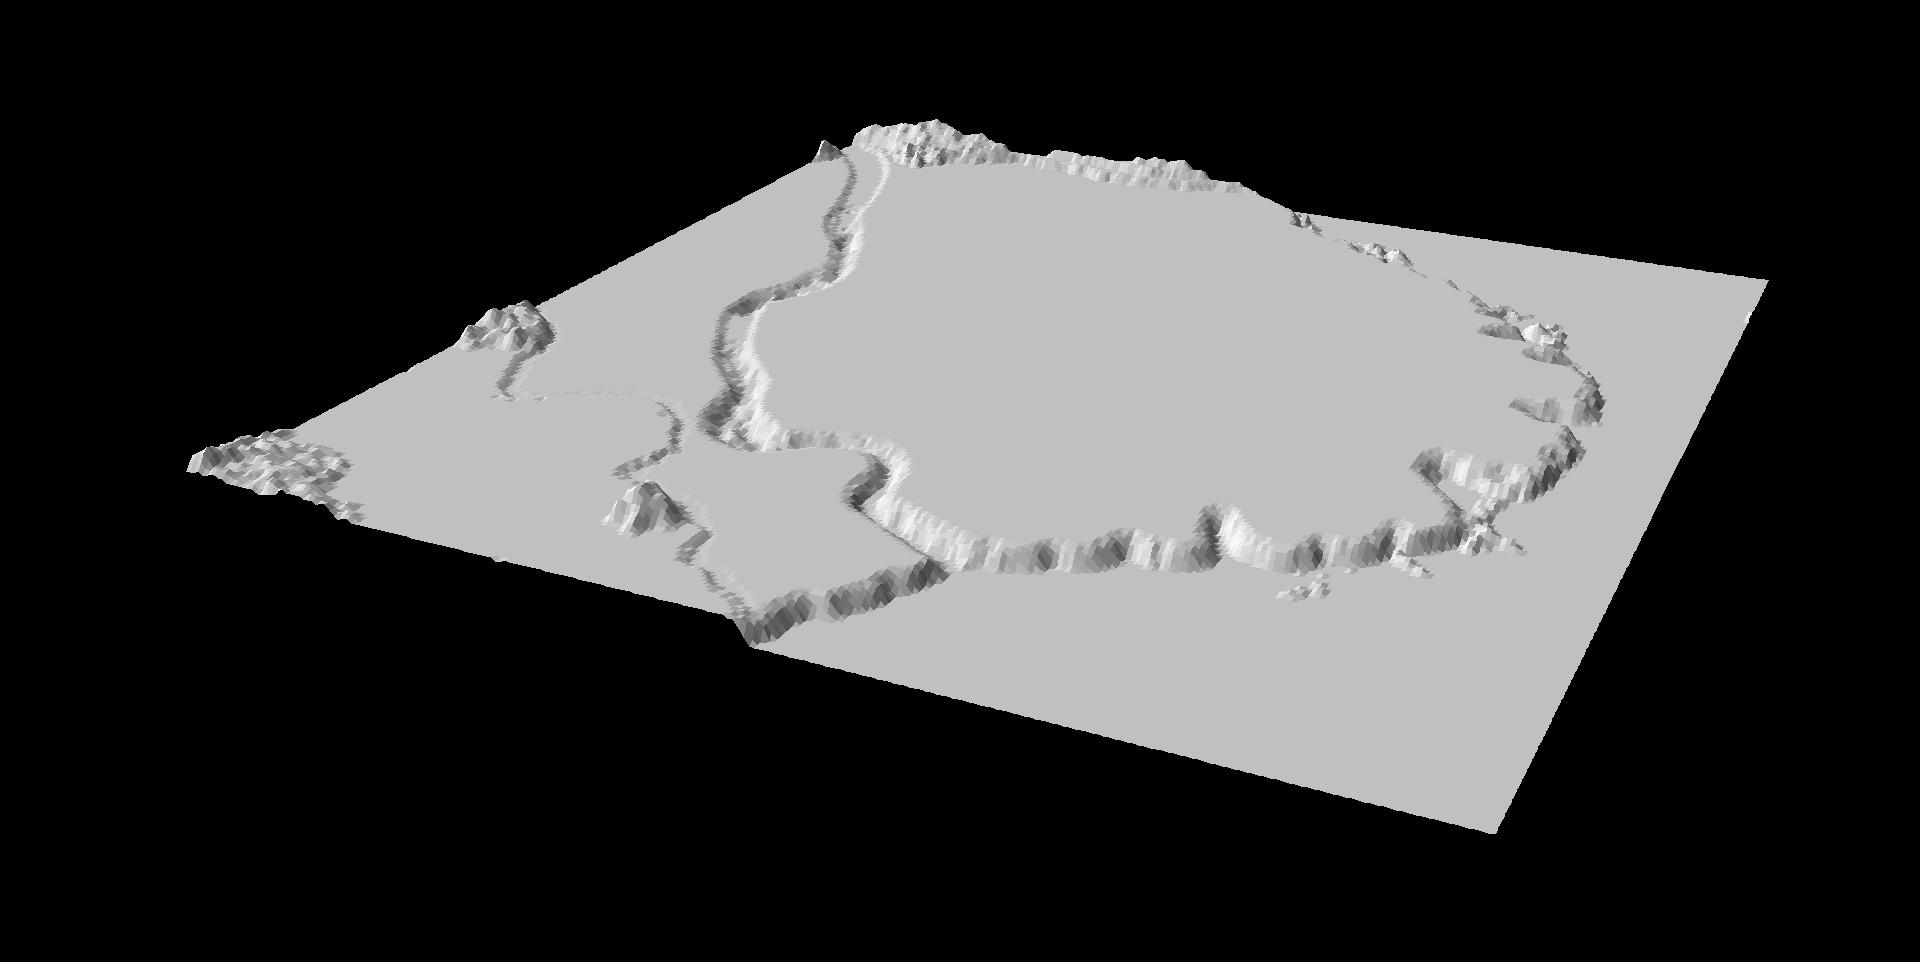 https://neorail.jp/forum/uploads/map_expert_init_heightmap_R_0.5_0621-1700.png